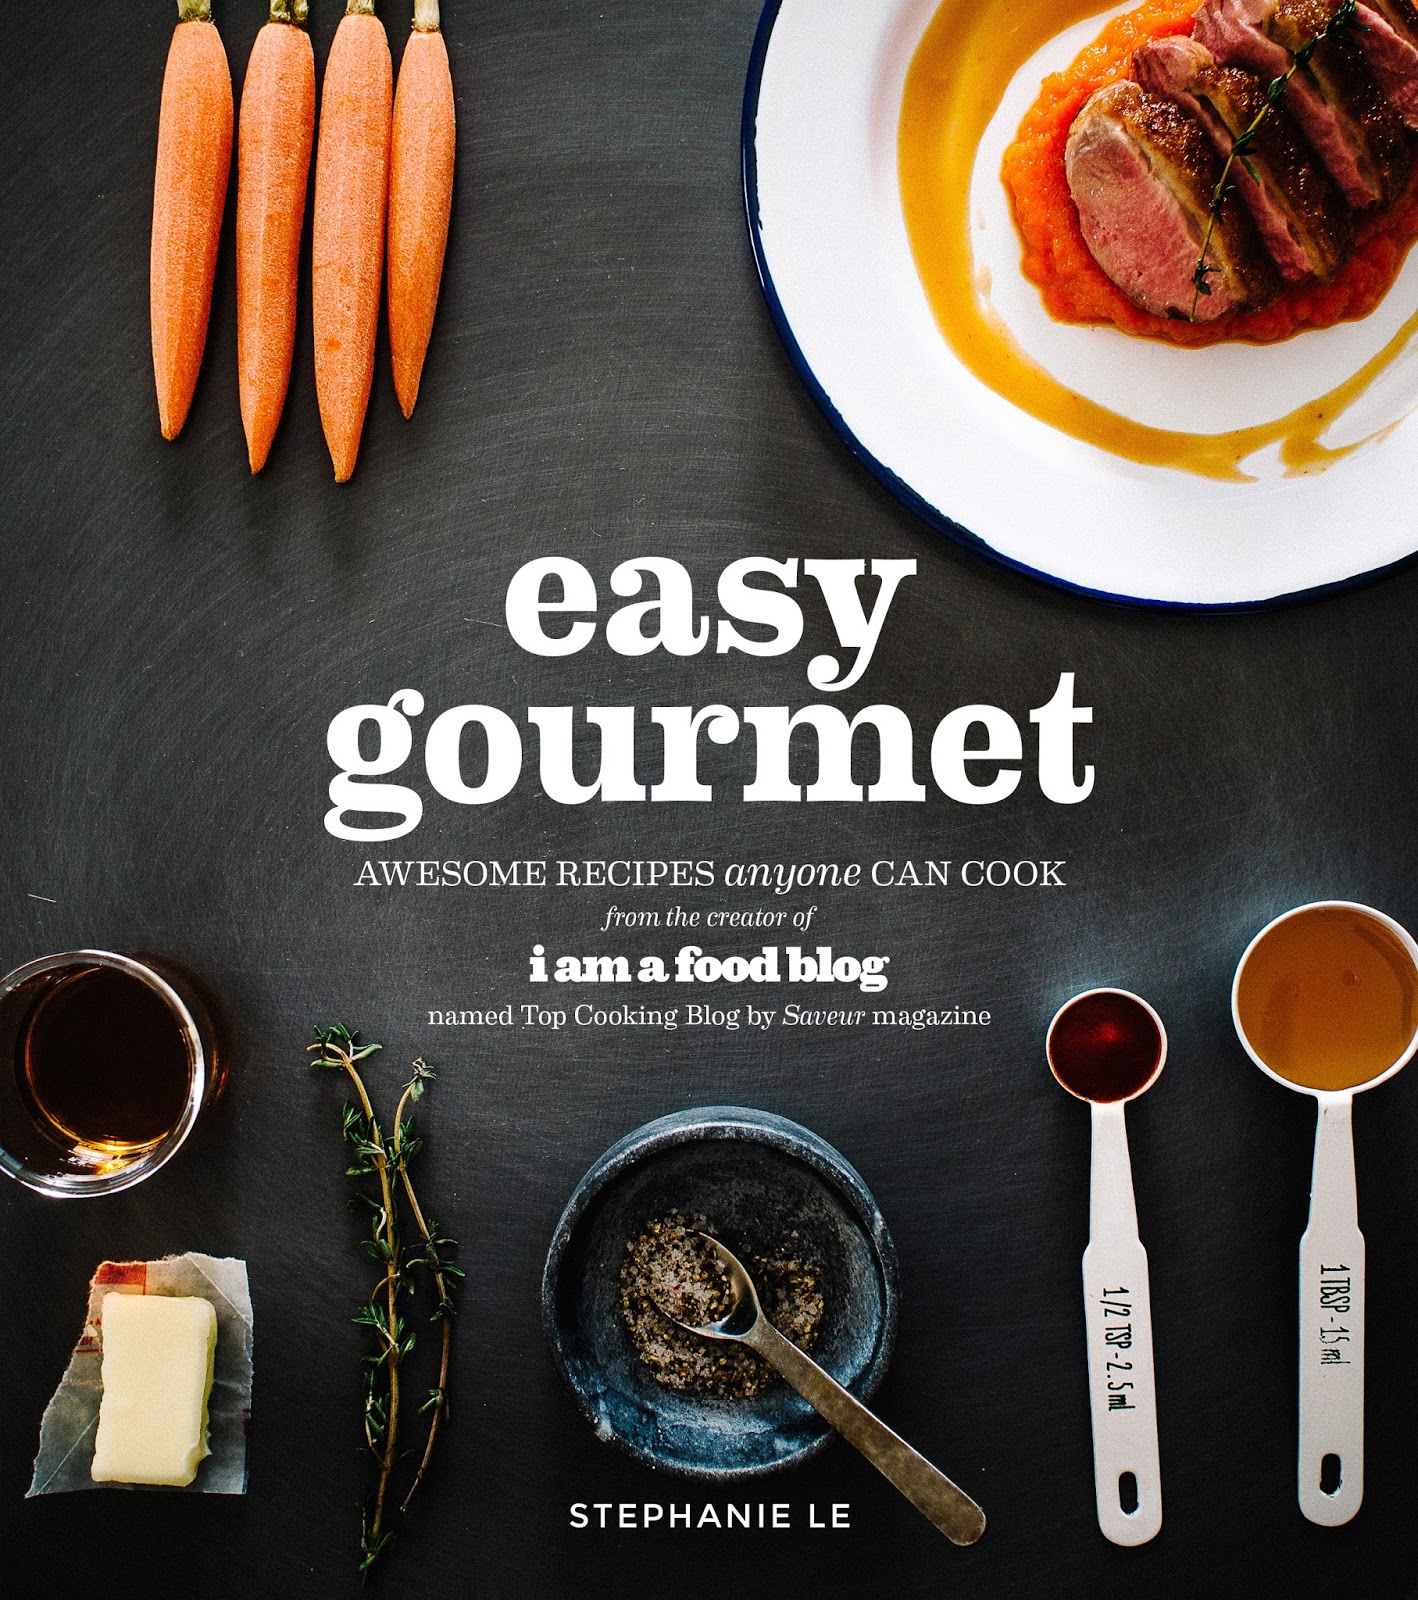 Dijon mushrooms easy gourmet cookbook blog tour all roads lead easy gourmet cookbook review forumfinder Images